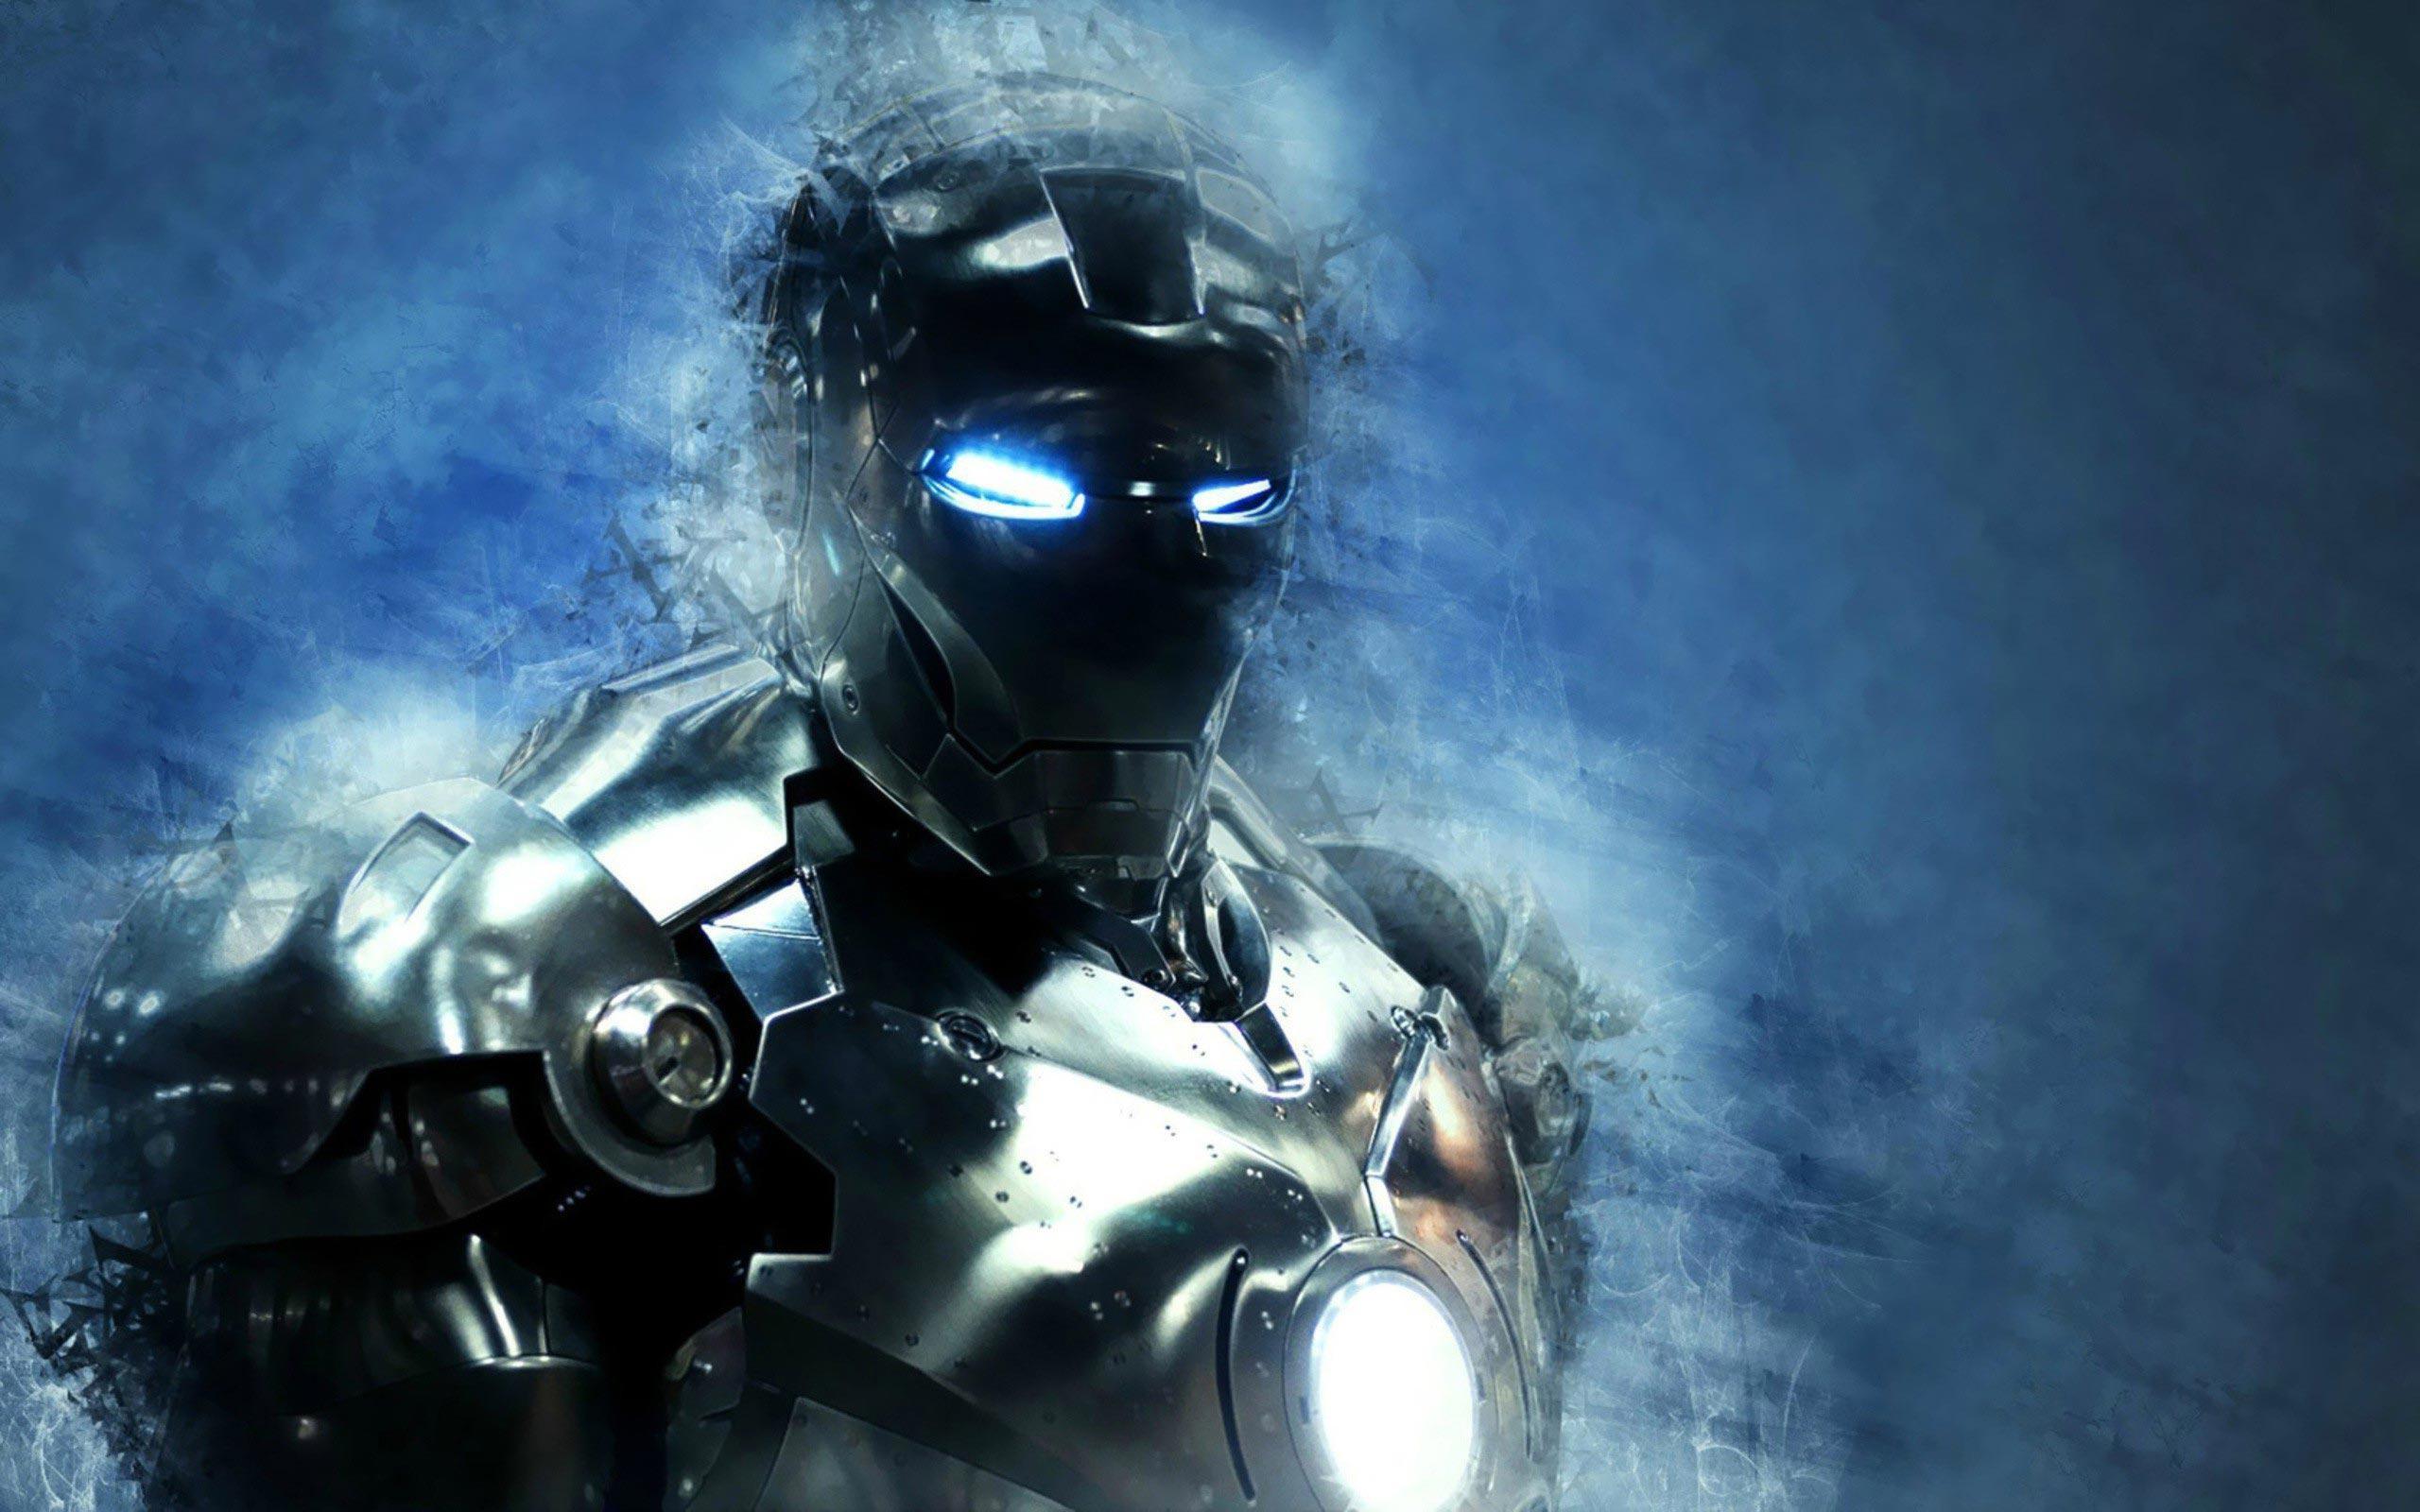 290955-blackangel 416035 iron_man_super_hero_superheroes_marvel_hd-wallpaper-1696760  …